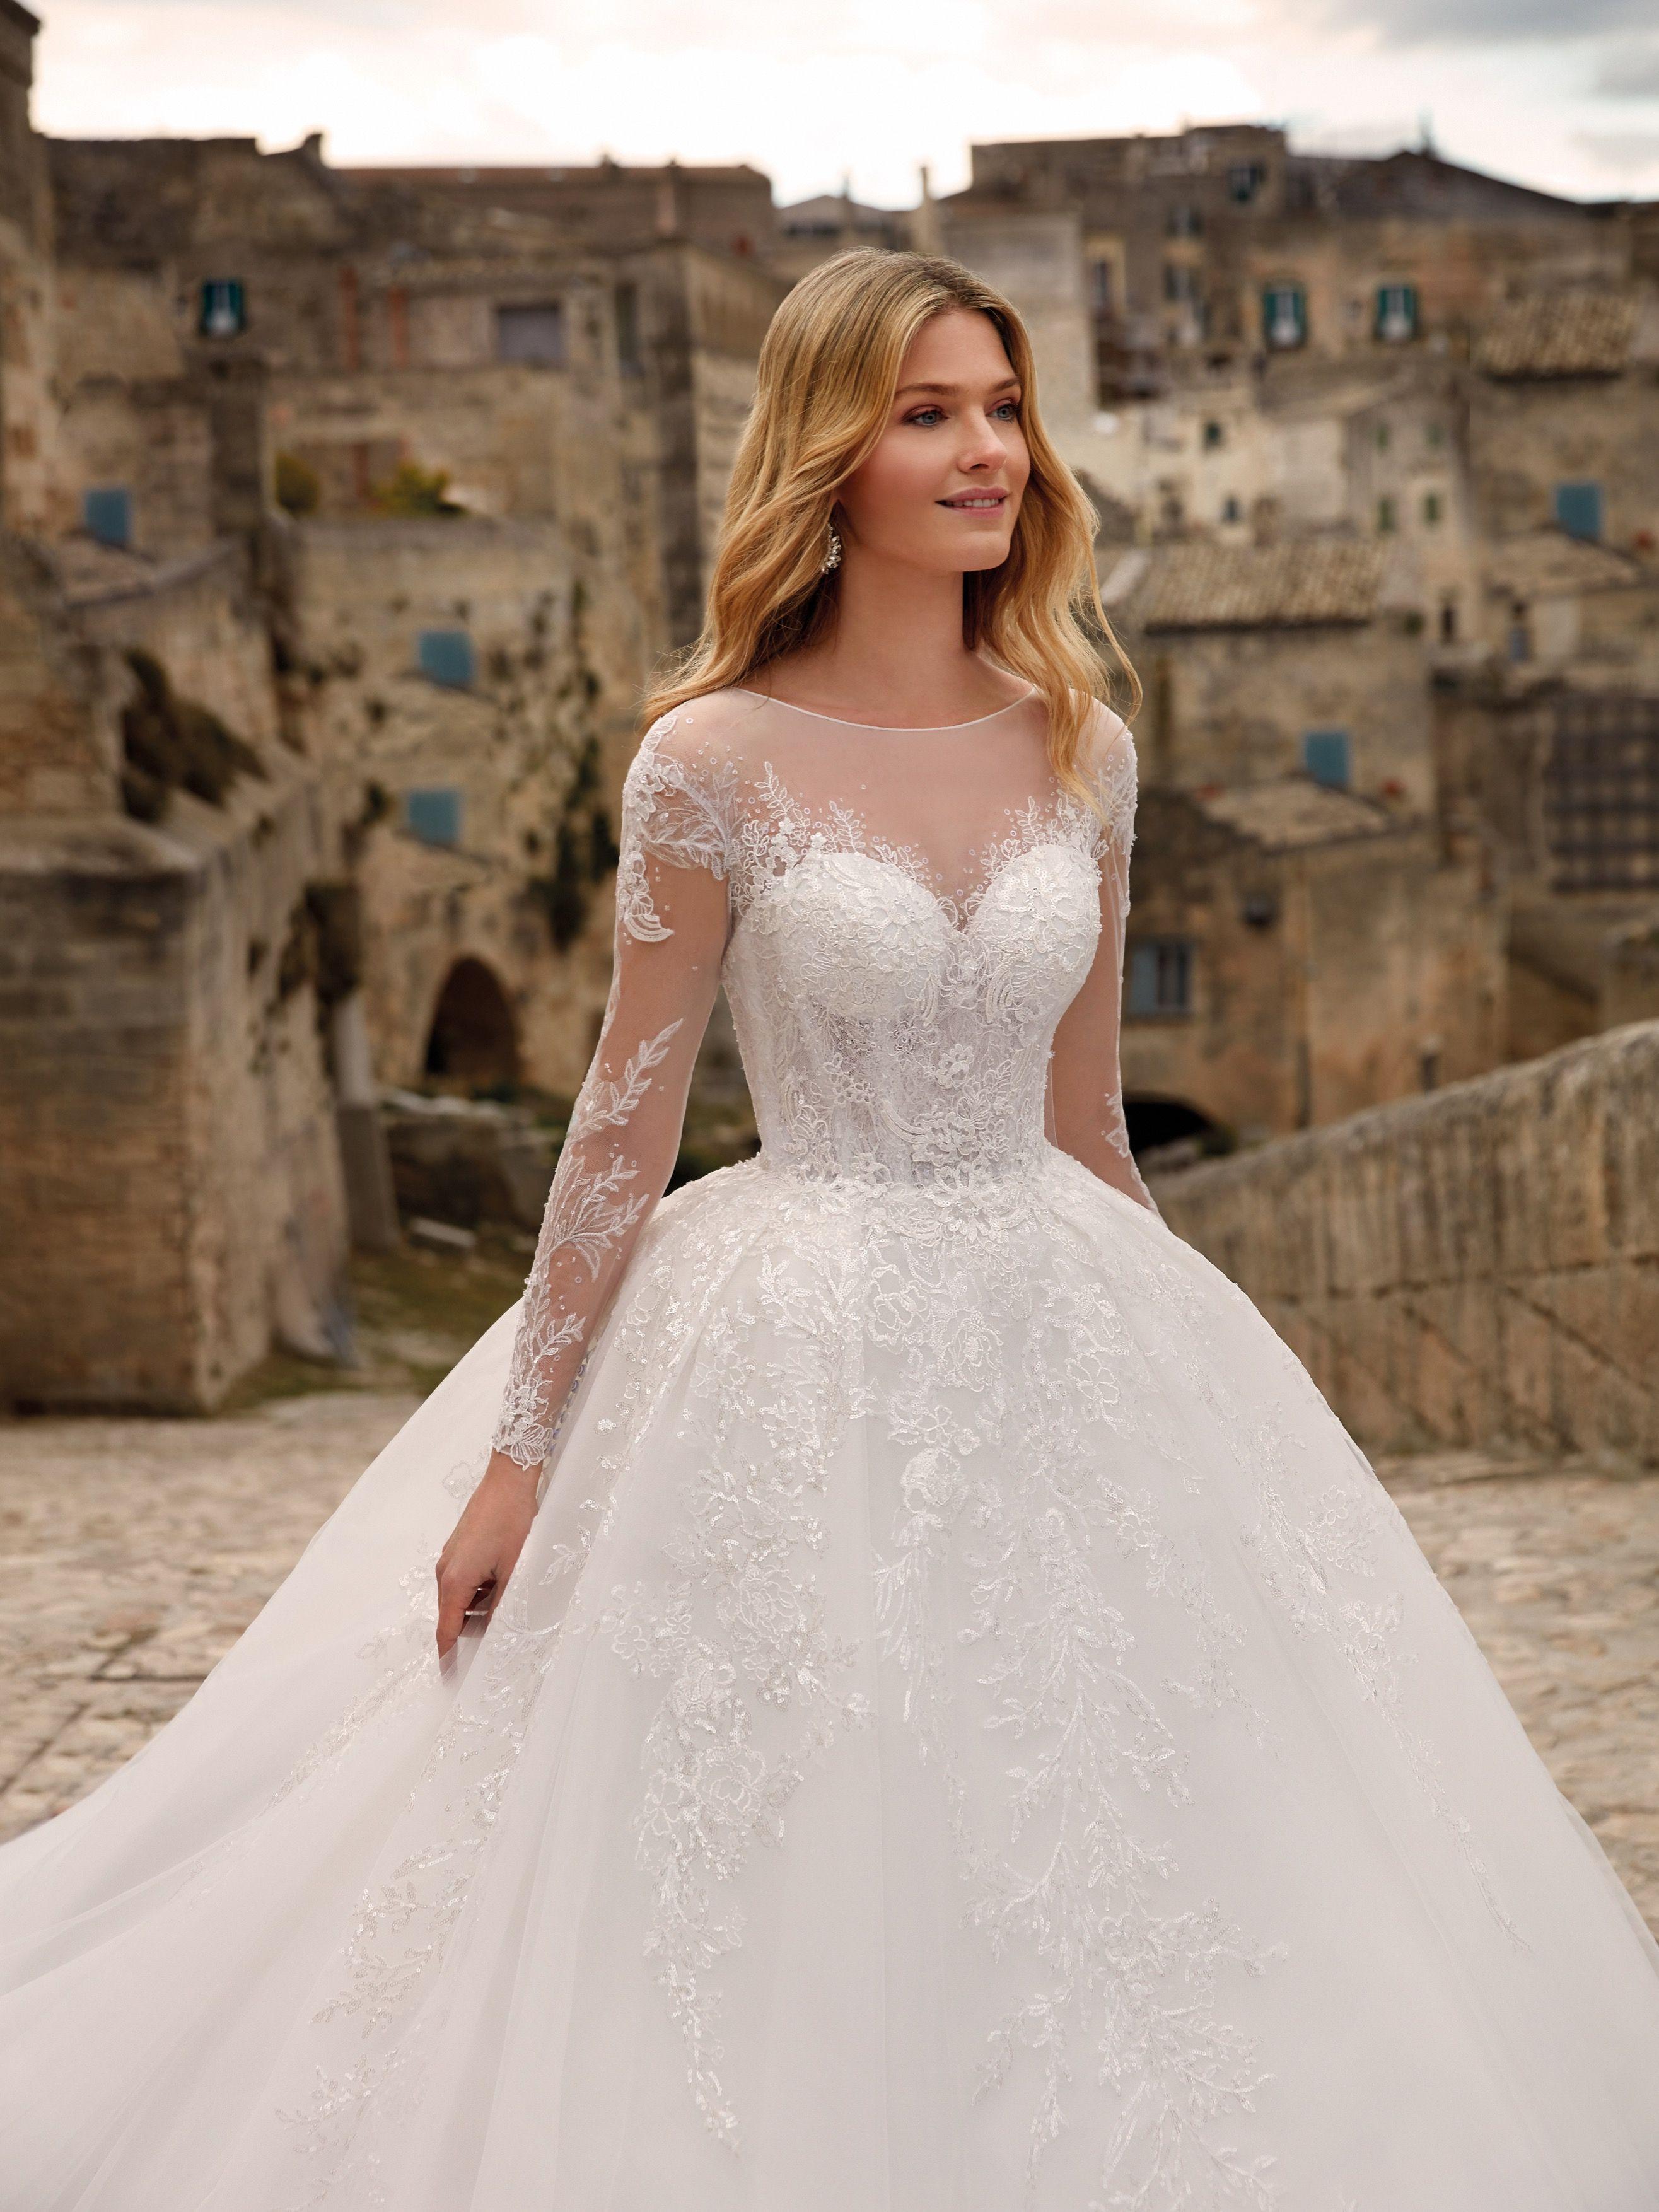 Glamorous Bateau Long Sleeves Wedding Dress Lace Princess Bridal Gowns Onlin Long Sleeve Wedding Dress Lace Wedding Dress Long Sleeve Ball Gown Wedding Dress [ 1350 x 1080 Pixel ]